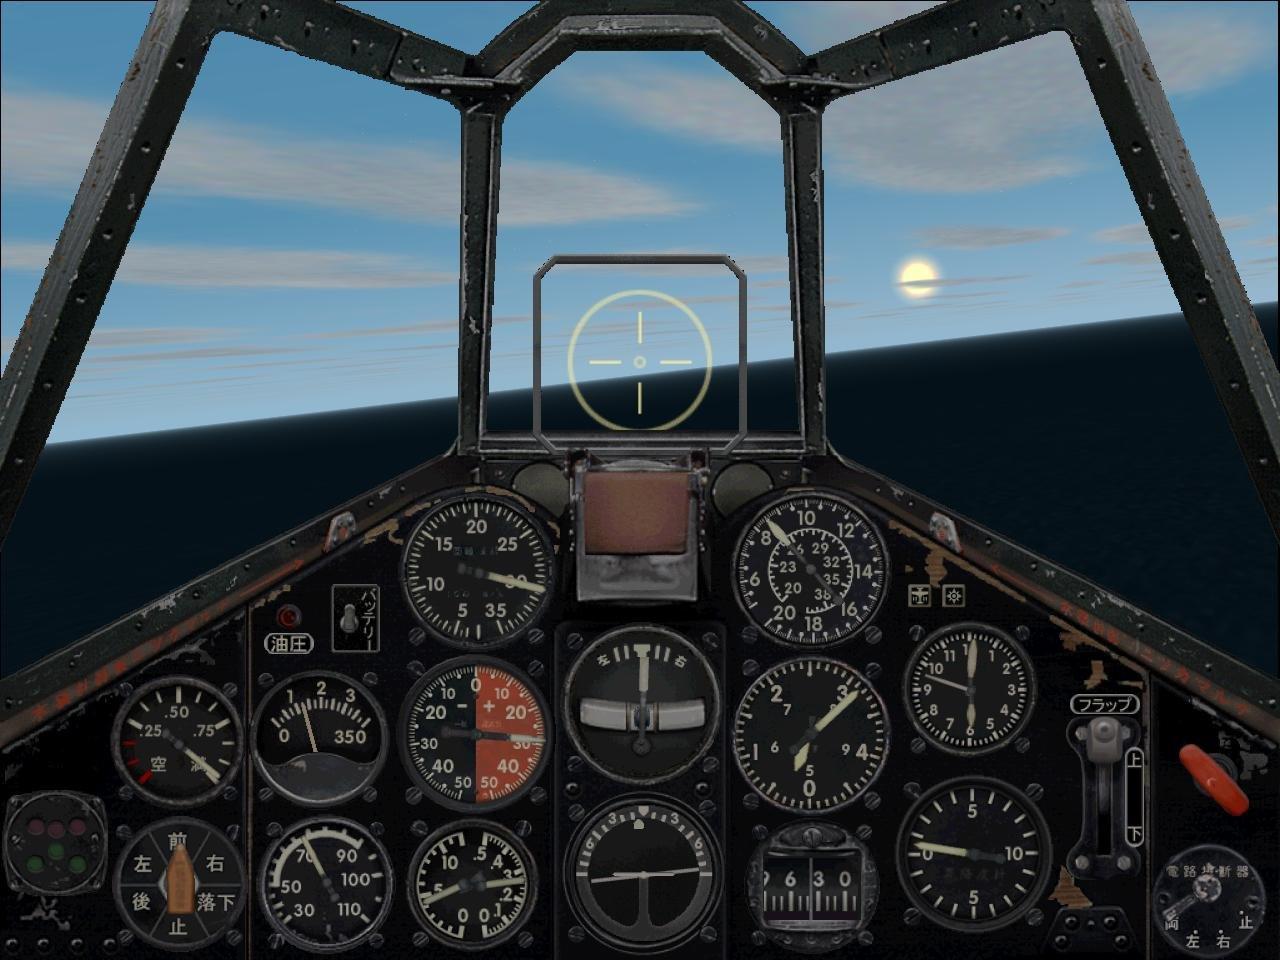 U Fix It >> Combat Flight Simulator 2 - PC Review and Full Download ...